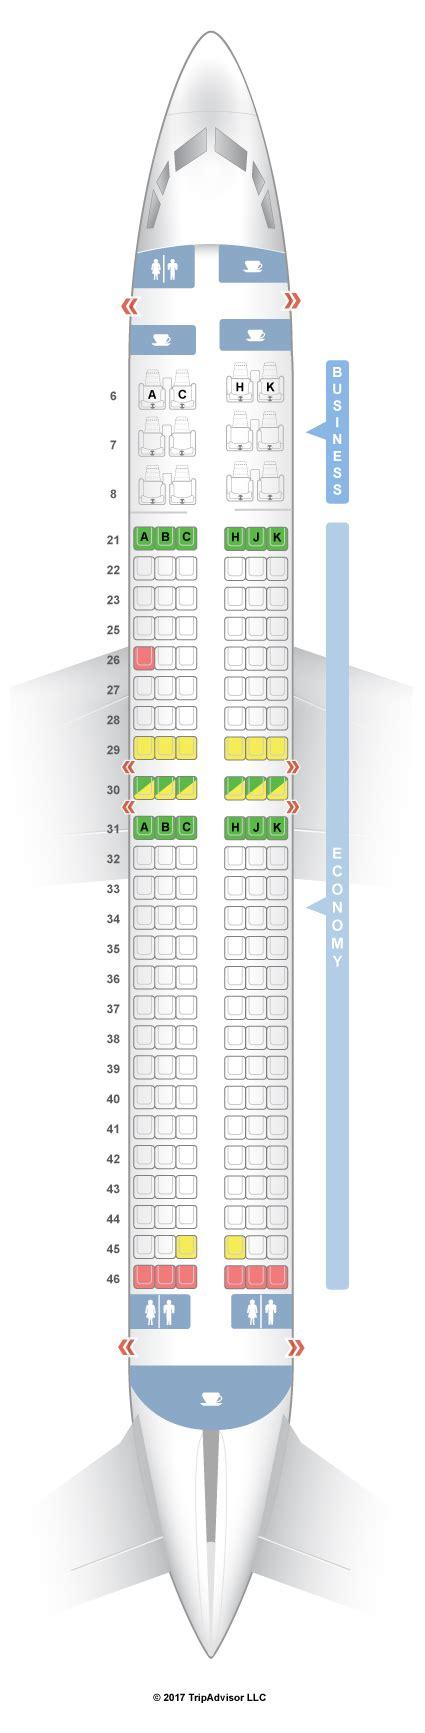 layout seat garuda seatguru seat map garuda indonesia boeing 737 800 738